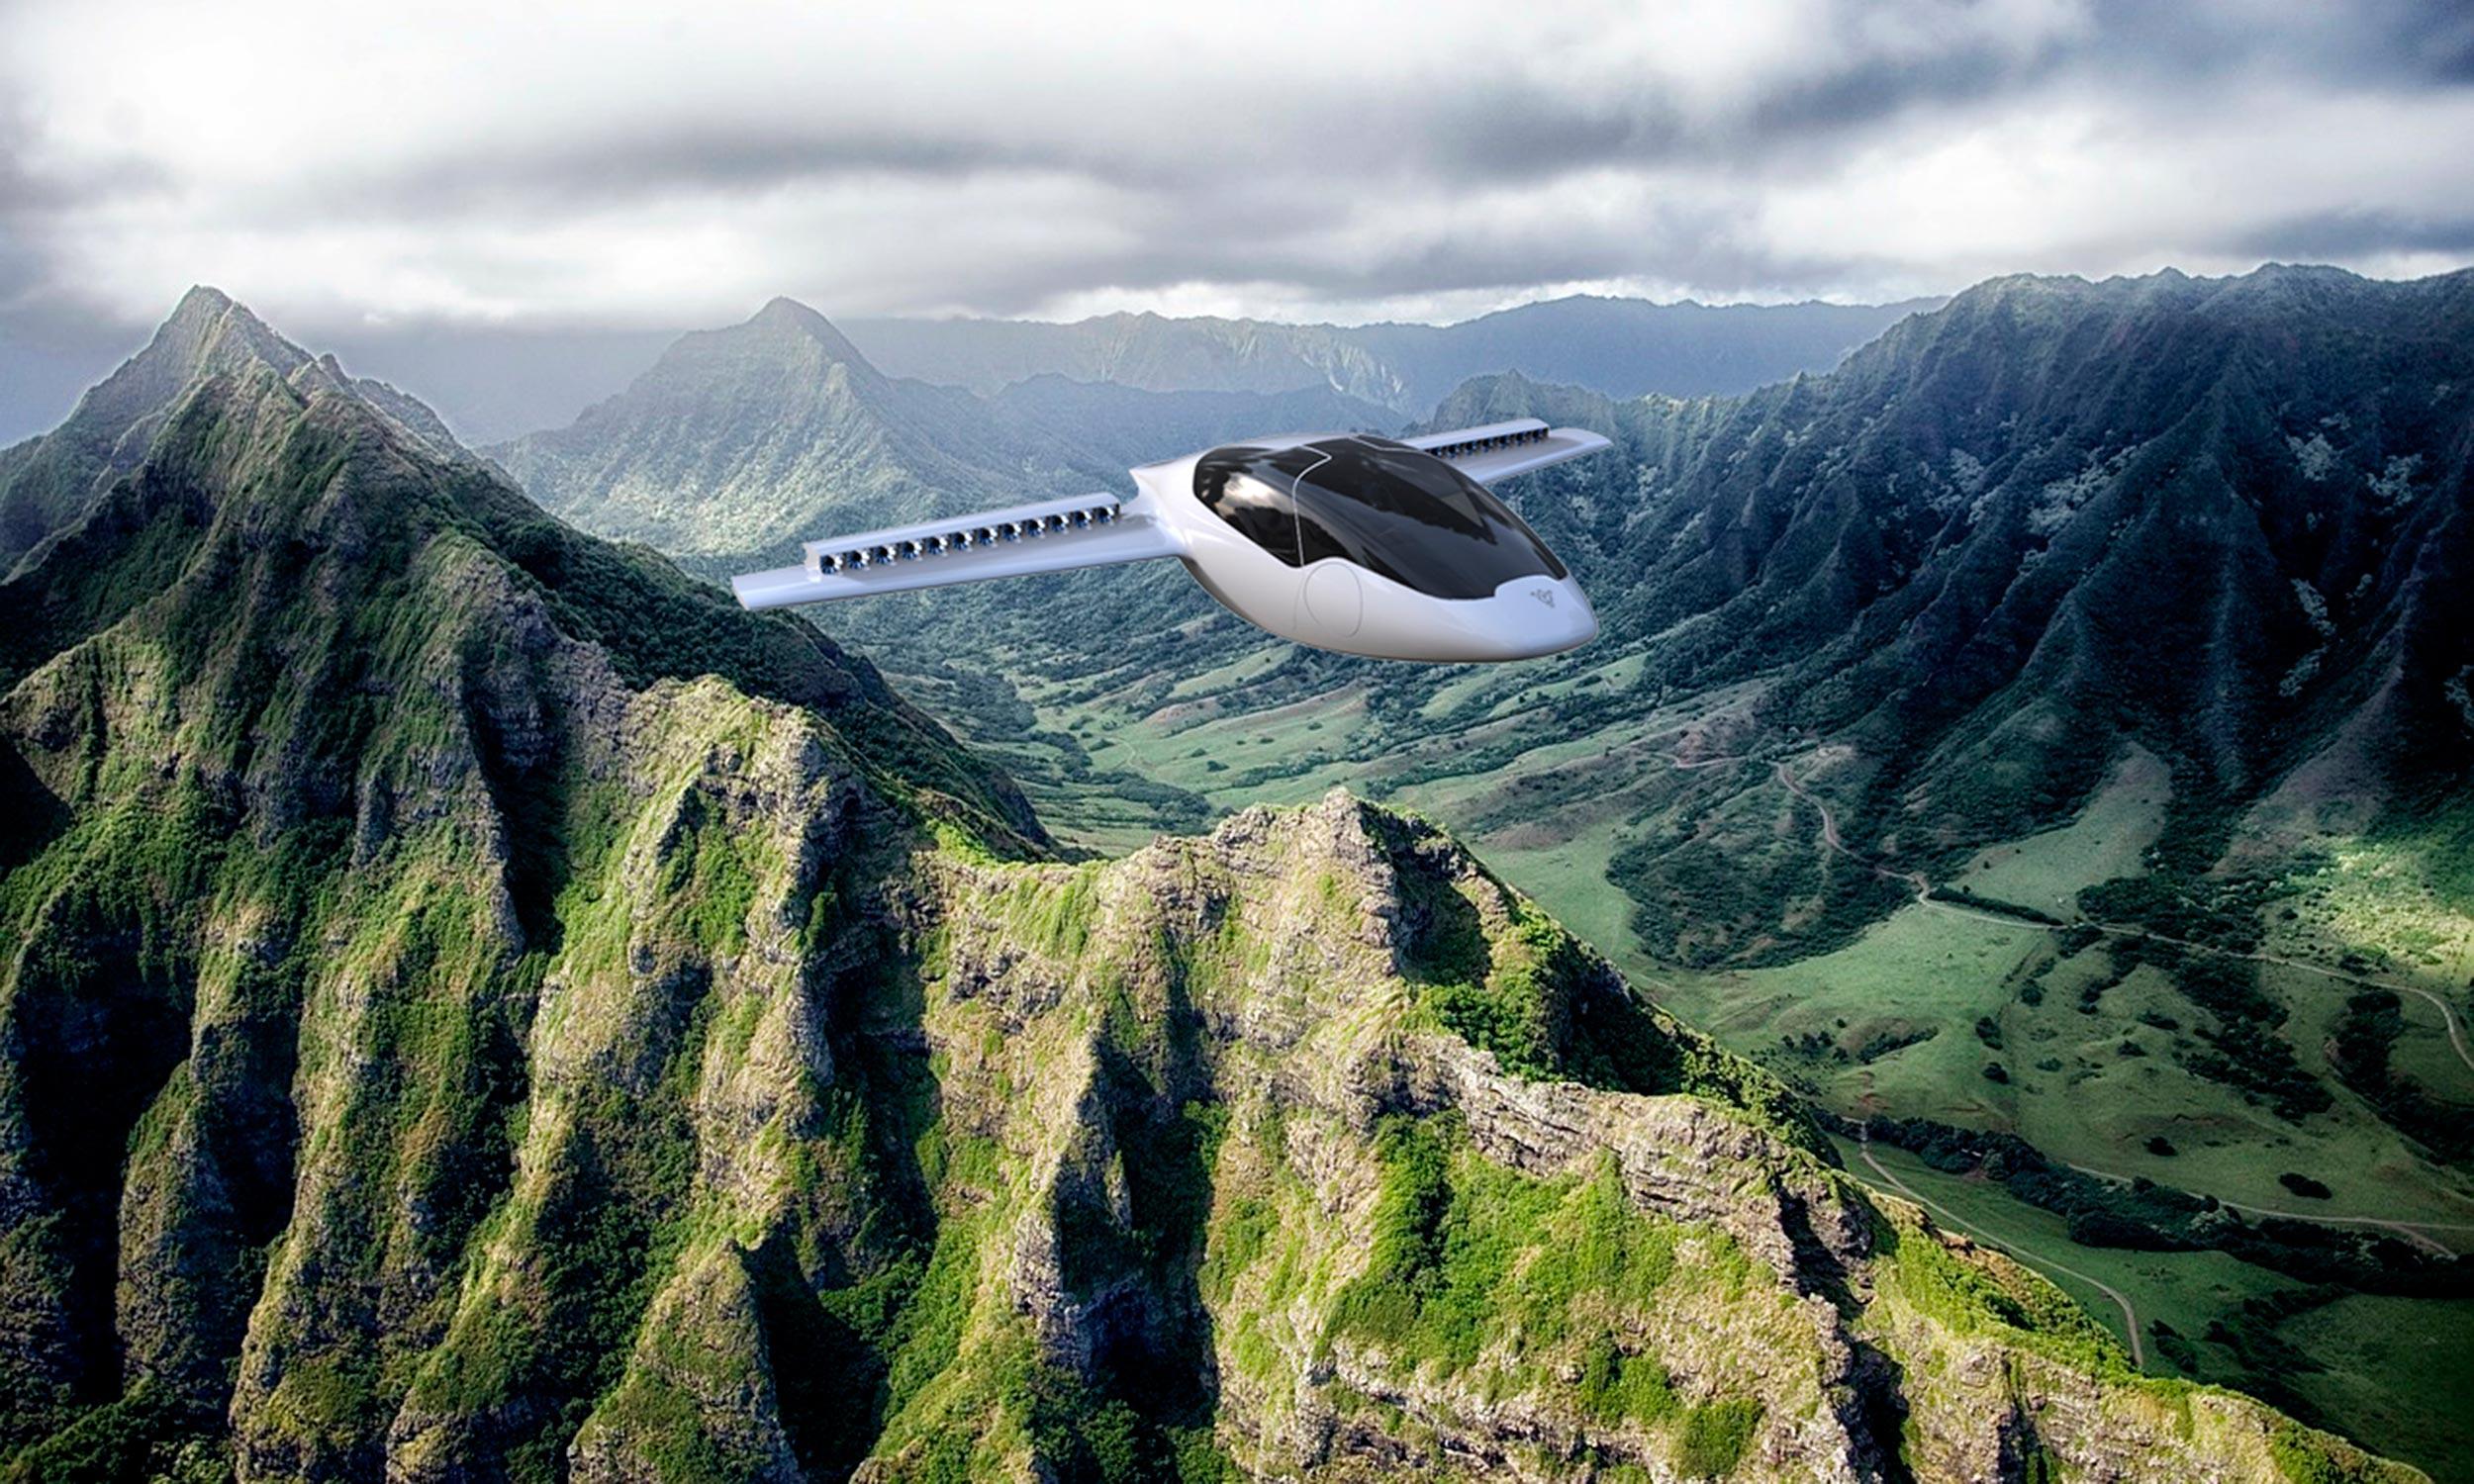 lilium-jet-mountain-flight